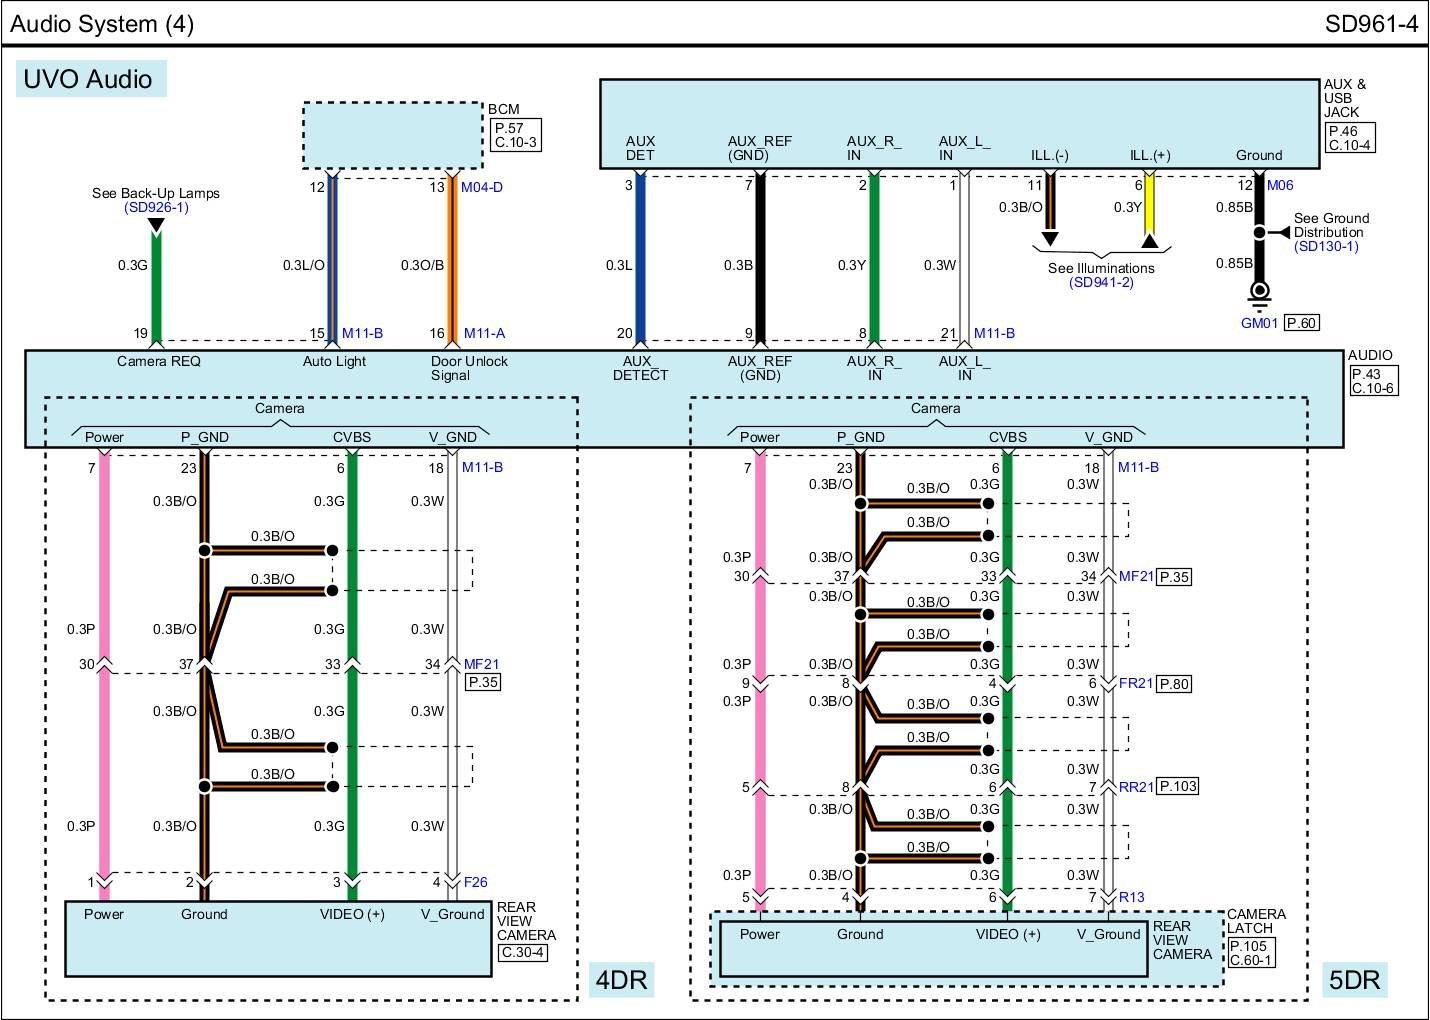 Kia Rio Wiring Diagram - Wiring Diagram Dash Kia Wiring Diagrams on kia engine diagram, kia relay diagram, kia service, kia transmission diagram, kia fuse diagram, kia soul stereo system wiring, kia steering diagram, kia ecu diagram, 05 kia sportage radio wire diagram, kia optima stereo diagram, kia belt diagram, kia radio wiring harness, kia sportage electrical diagram, kia air conditioning diagram, kia parts diagram, 2012 kia optima radio diagram, kia fuel pump wiring,